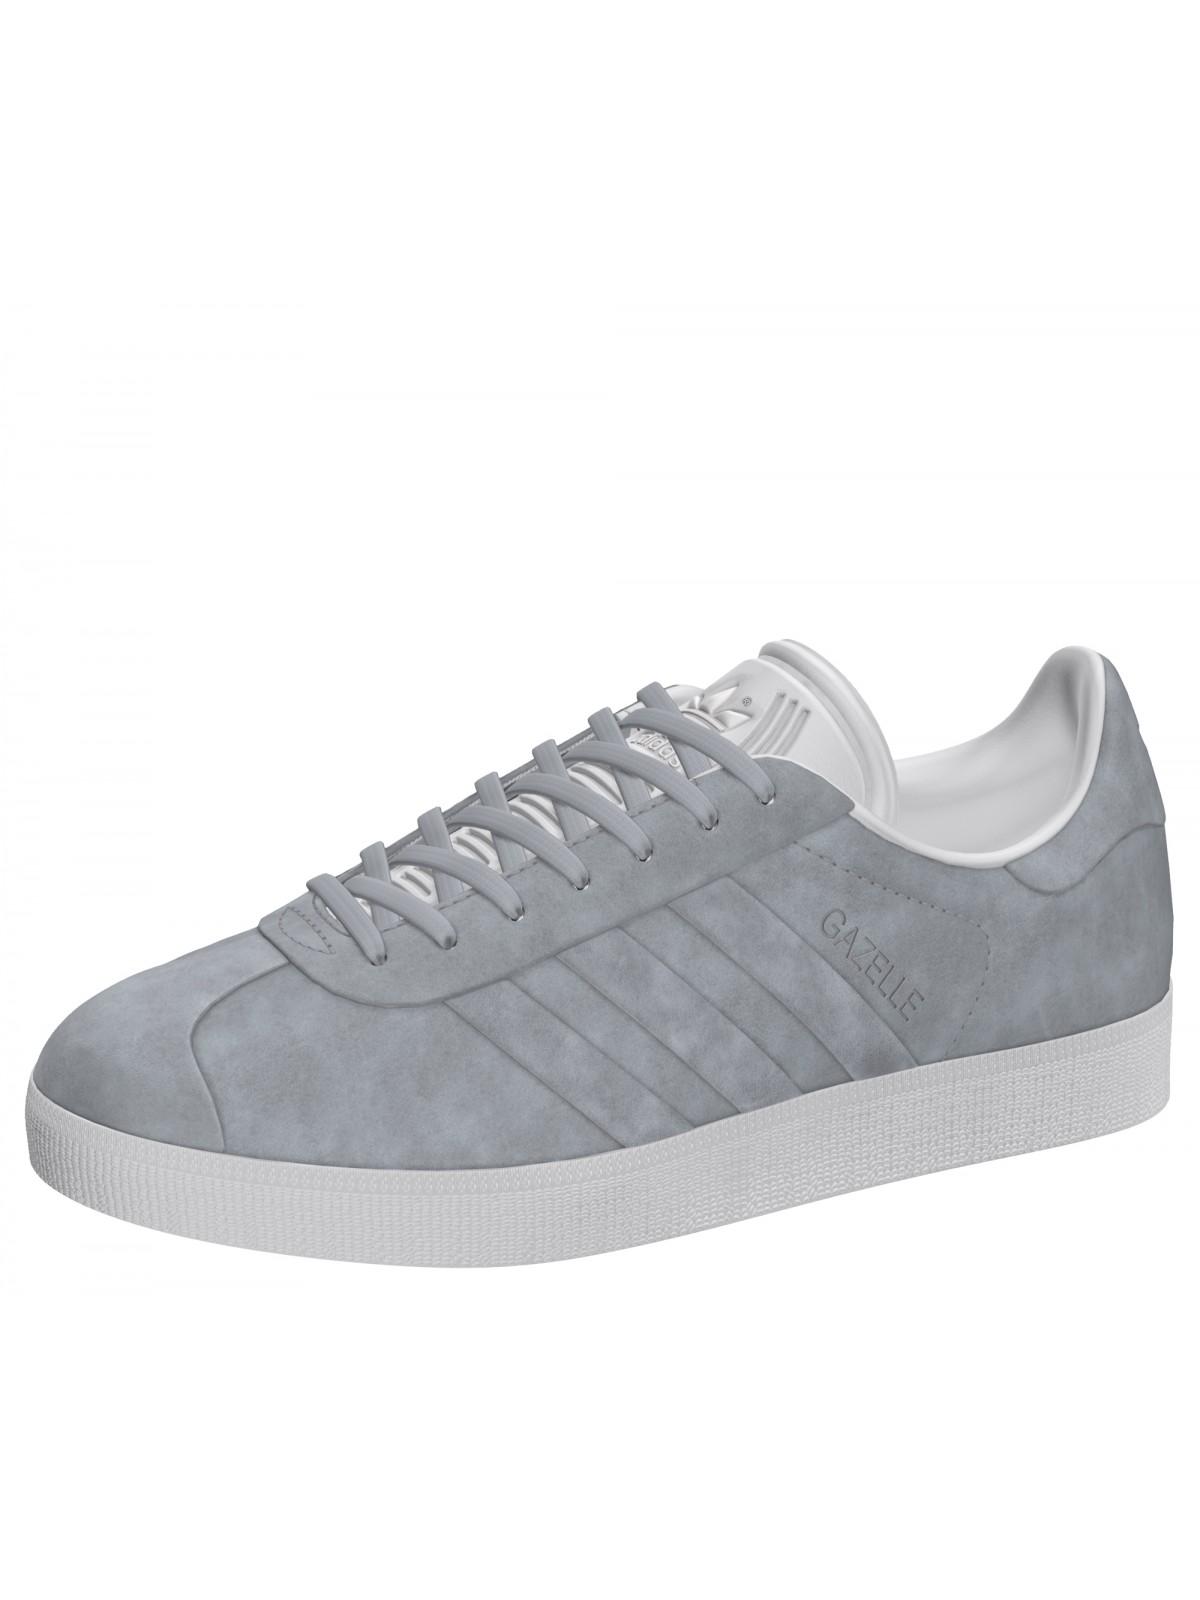 adidas gazelle grise promo